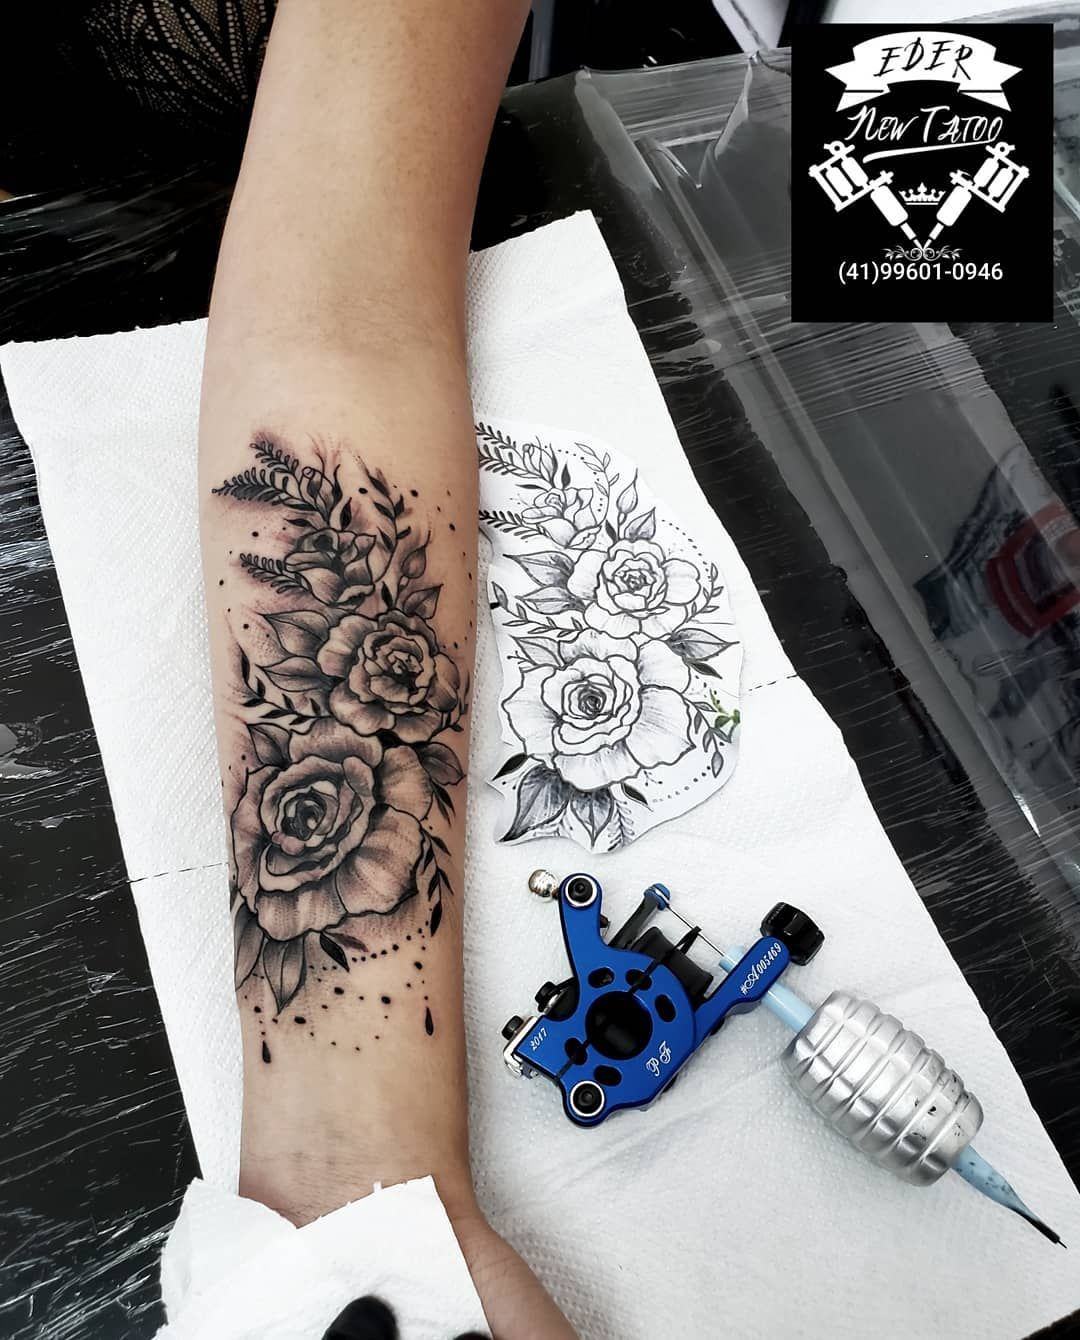 Eder Barbosa #tattoorosablackandgray #tattooink #tattoodo #instanize #tattoobr  para orçamentos chamar inbox ou whats 🔴(41)99601-0946🔴EDER🆕️TATTOO